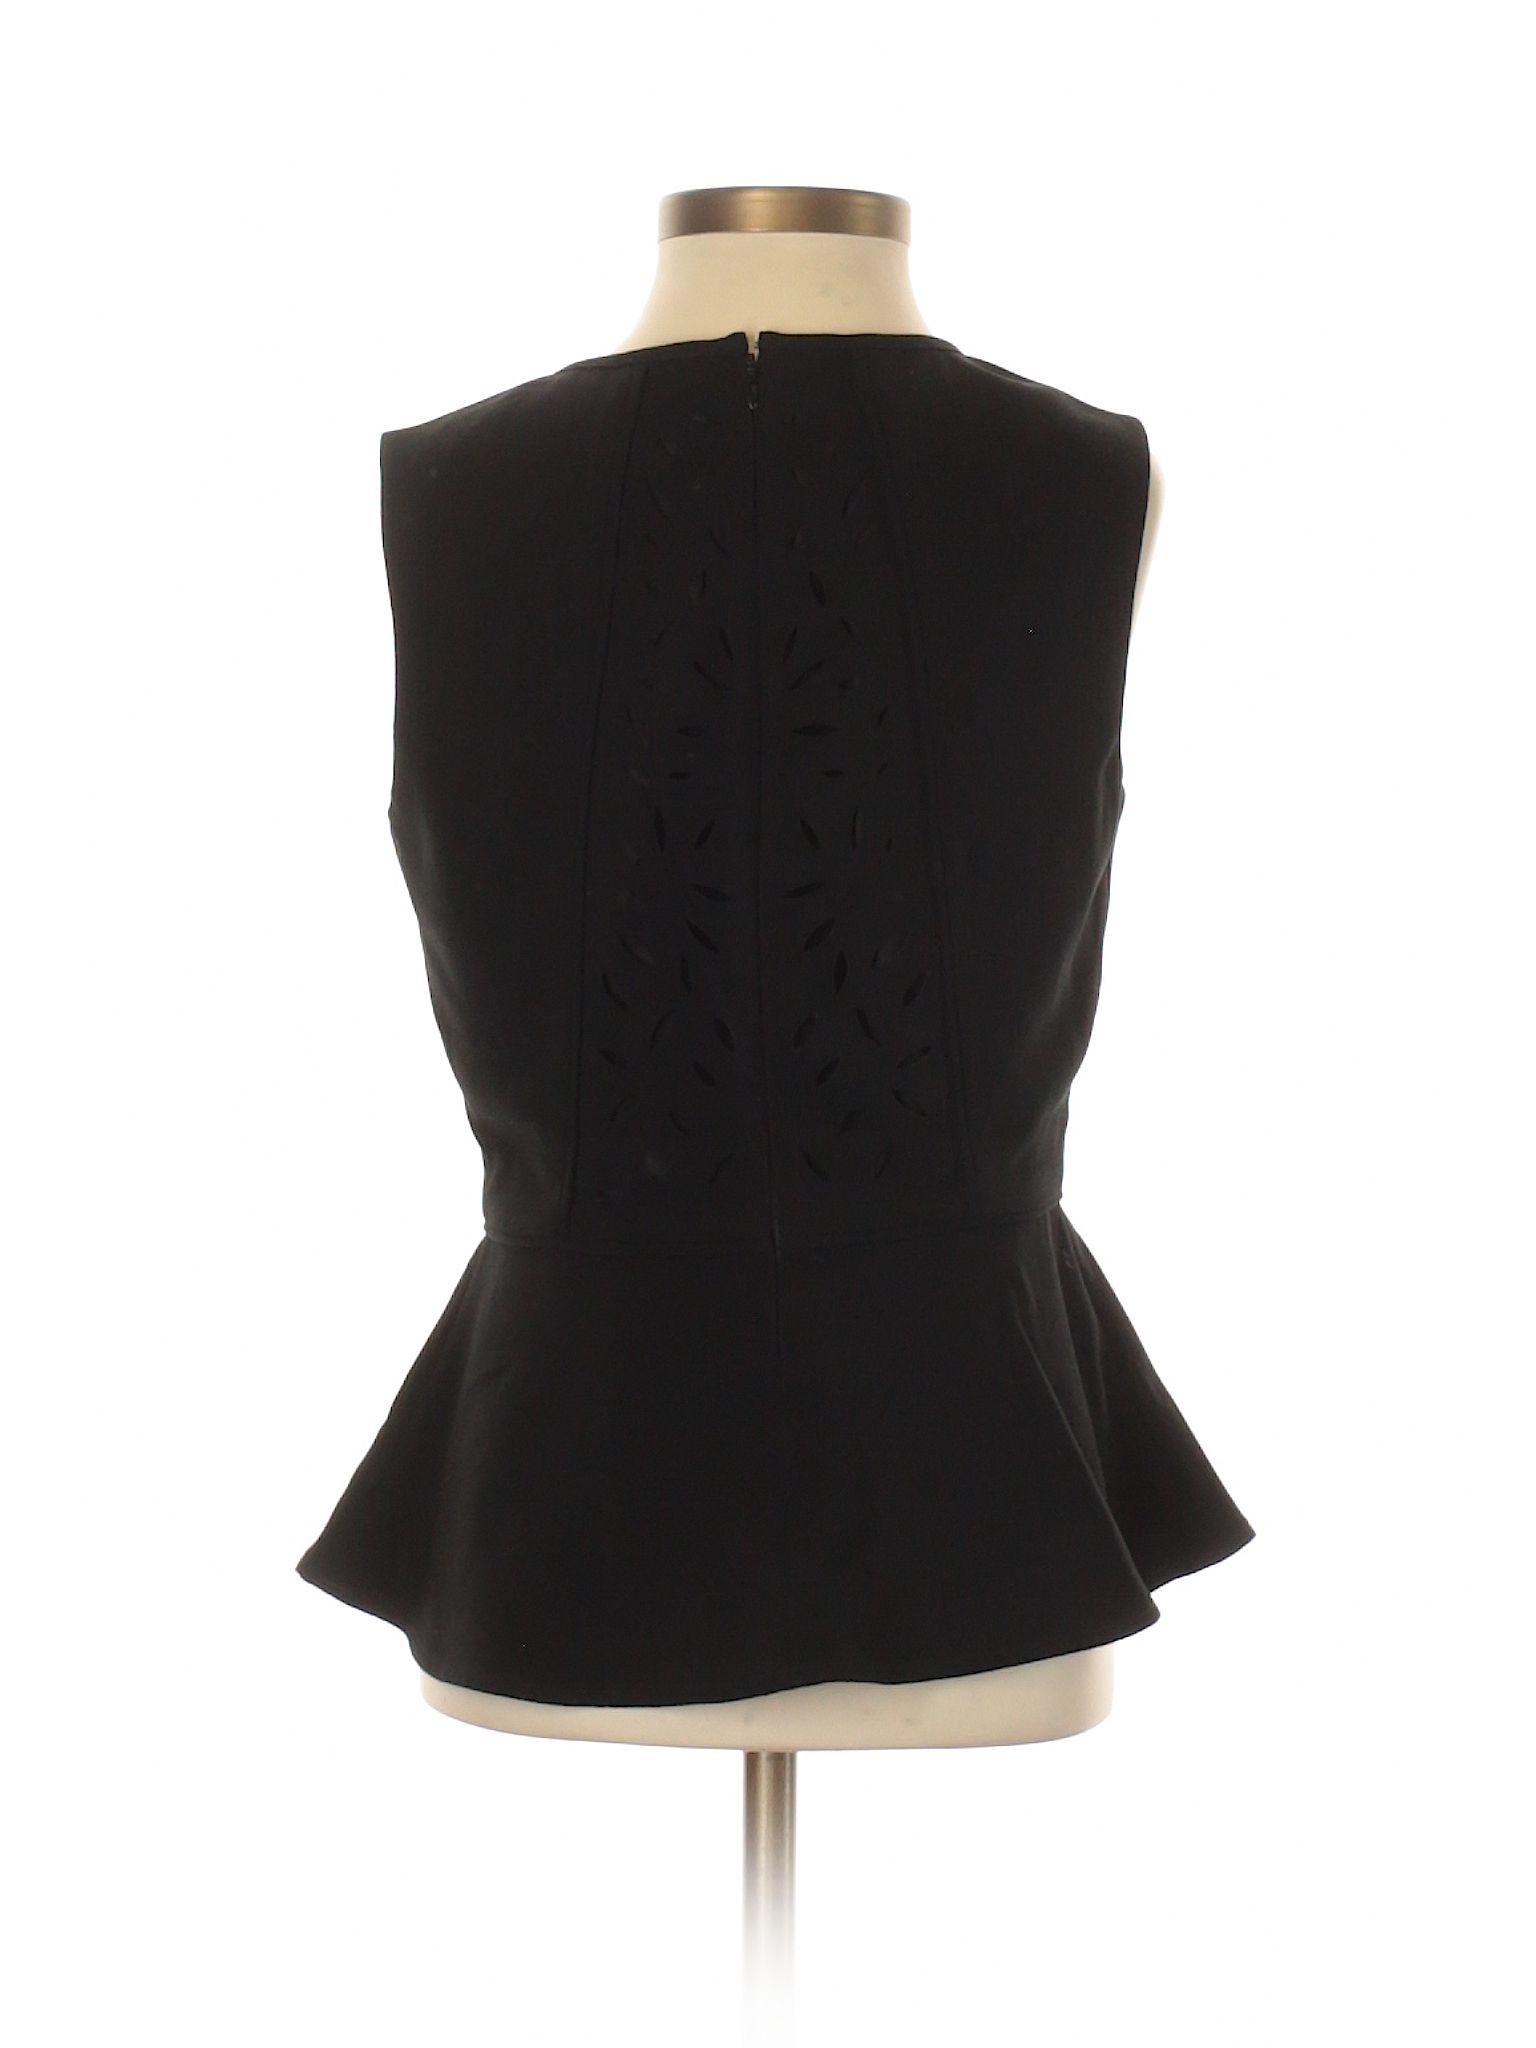 bf7db9740eaba7 Banana Republic Factory Store Sleeveless Blouse  Size 0.00 Black Women s  Tops -  6.99